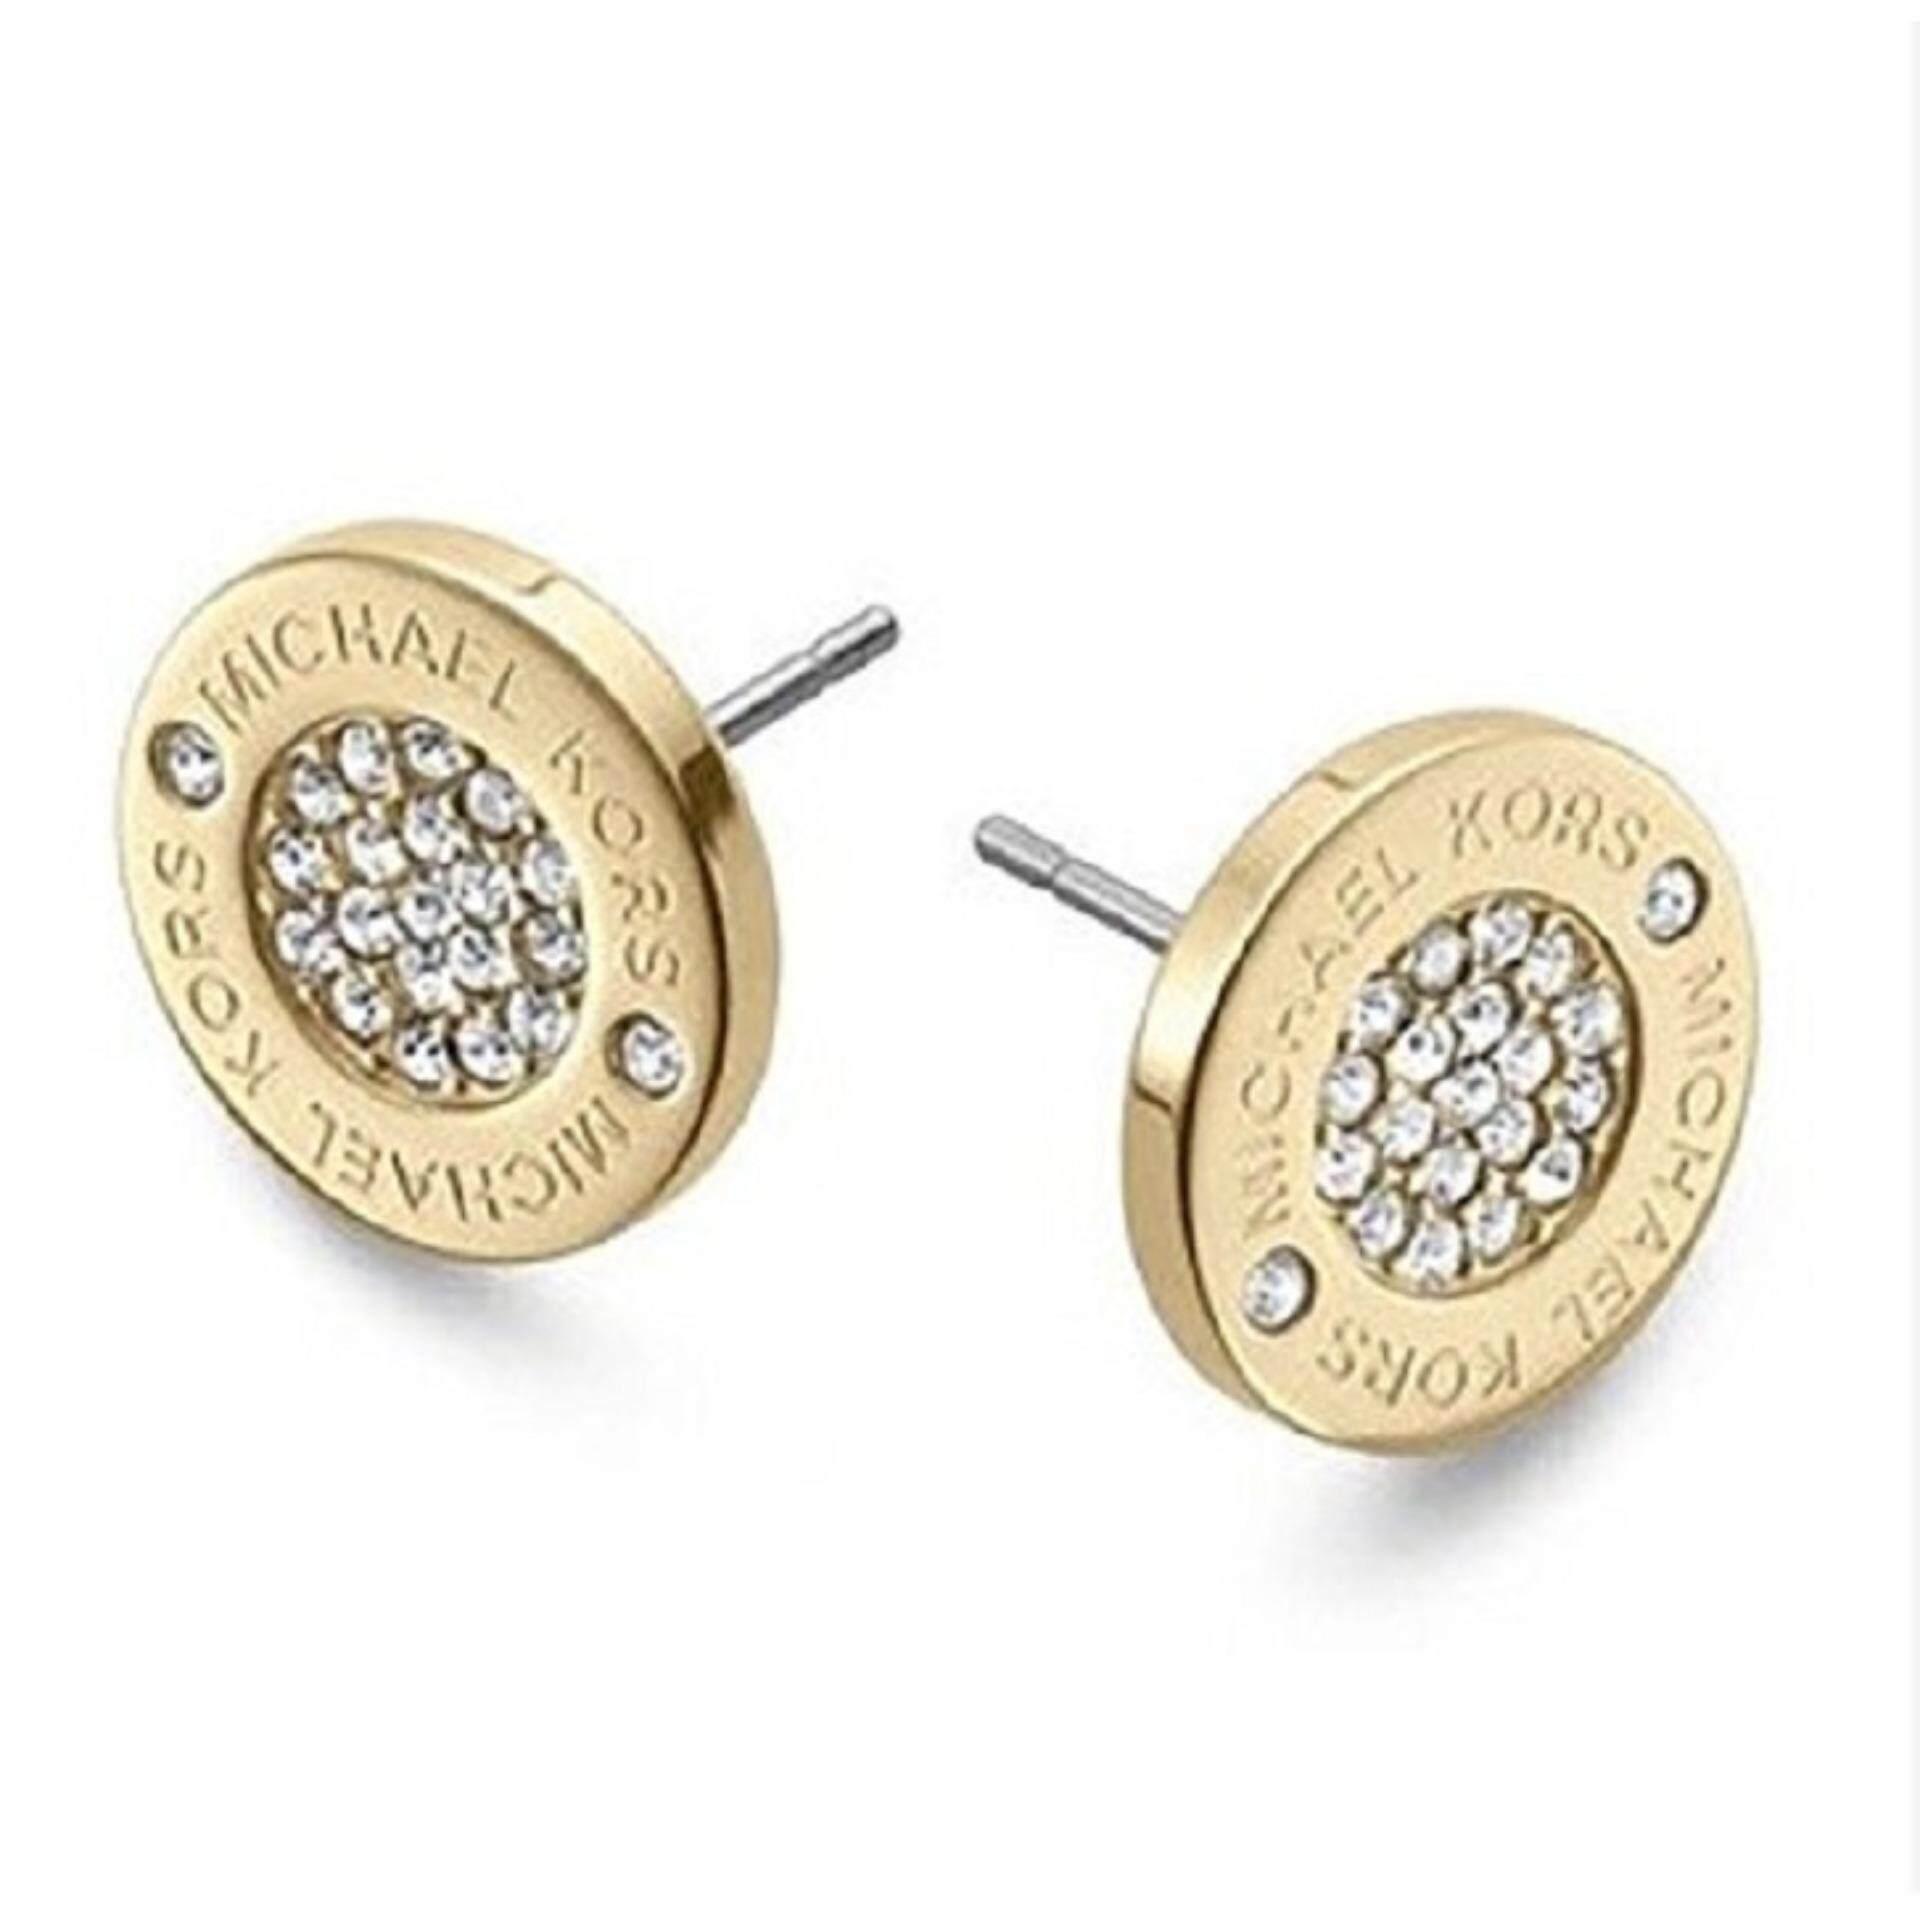 MK Gold Tone Stainless Steel Coated Stone Set Logo Stud Earrings